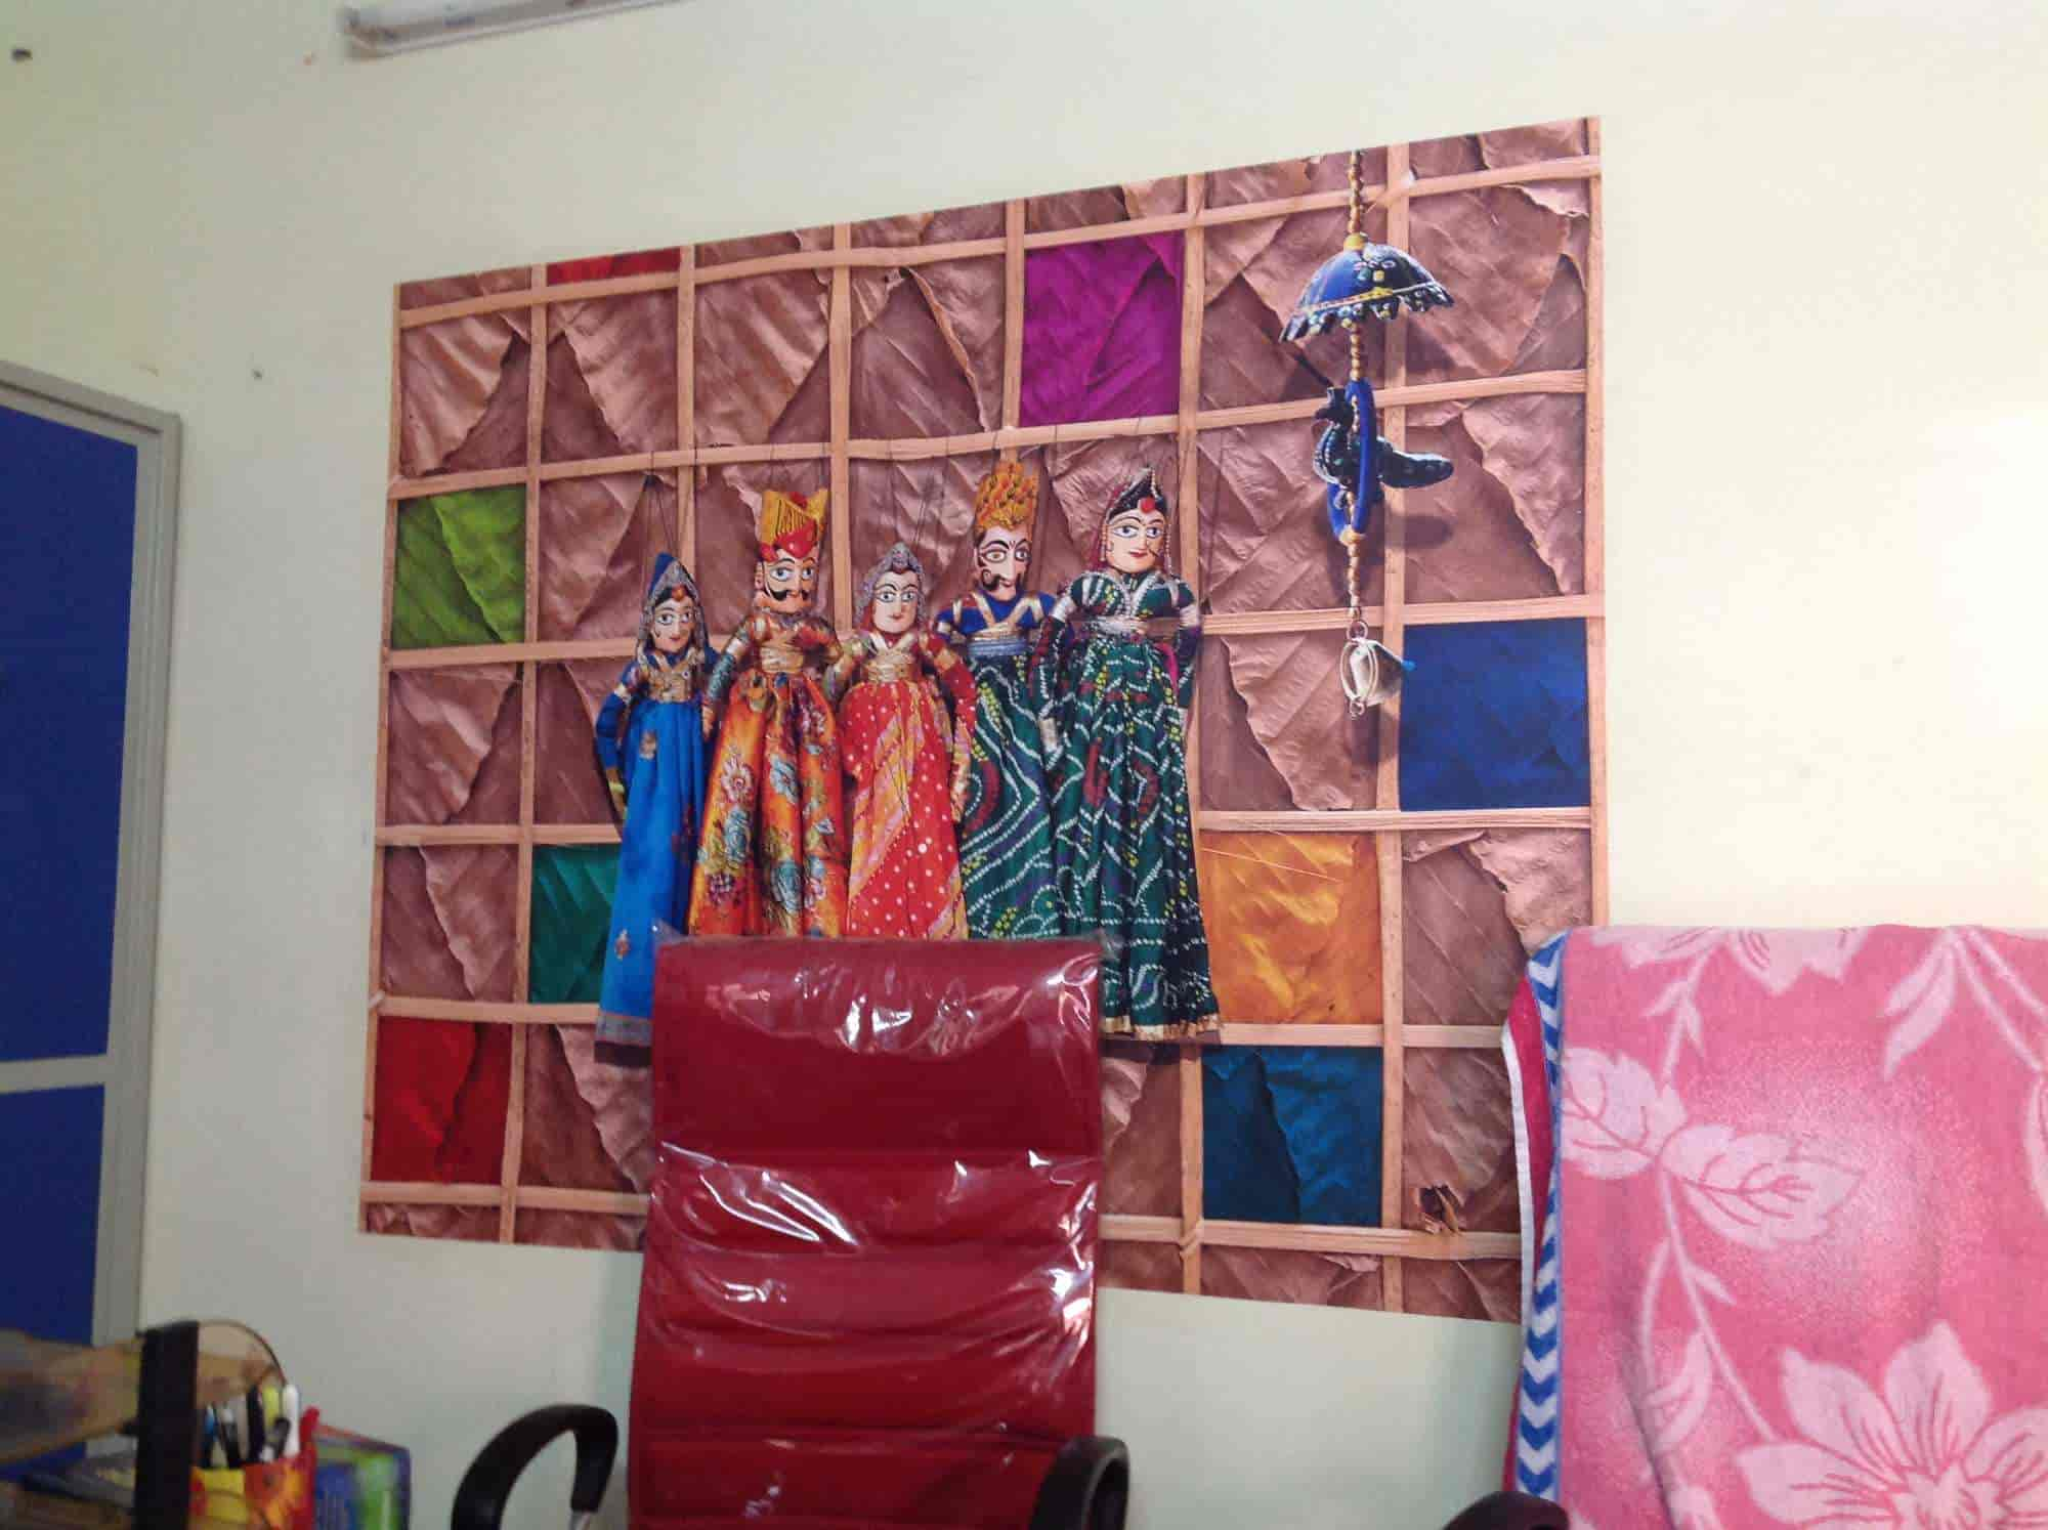 Infinity Unlimited Fashion Pragathi Nagar Readymade Garment Retailers In Nizamabad Justdial